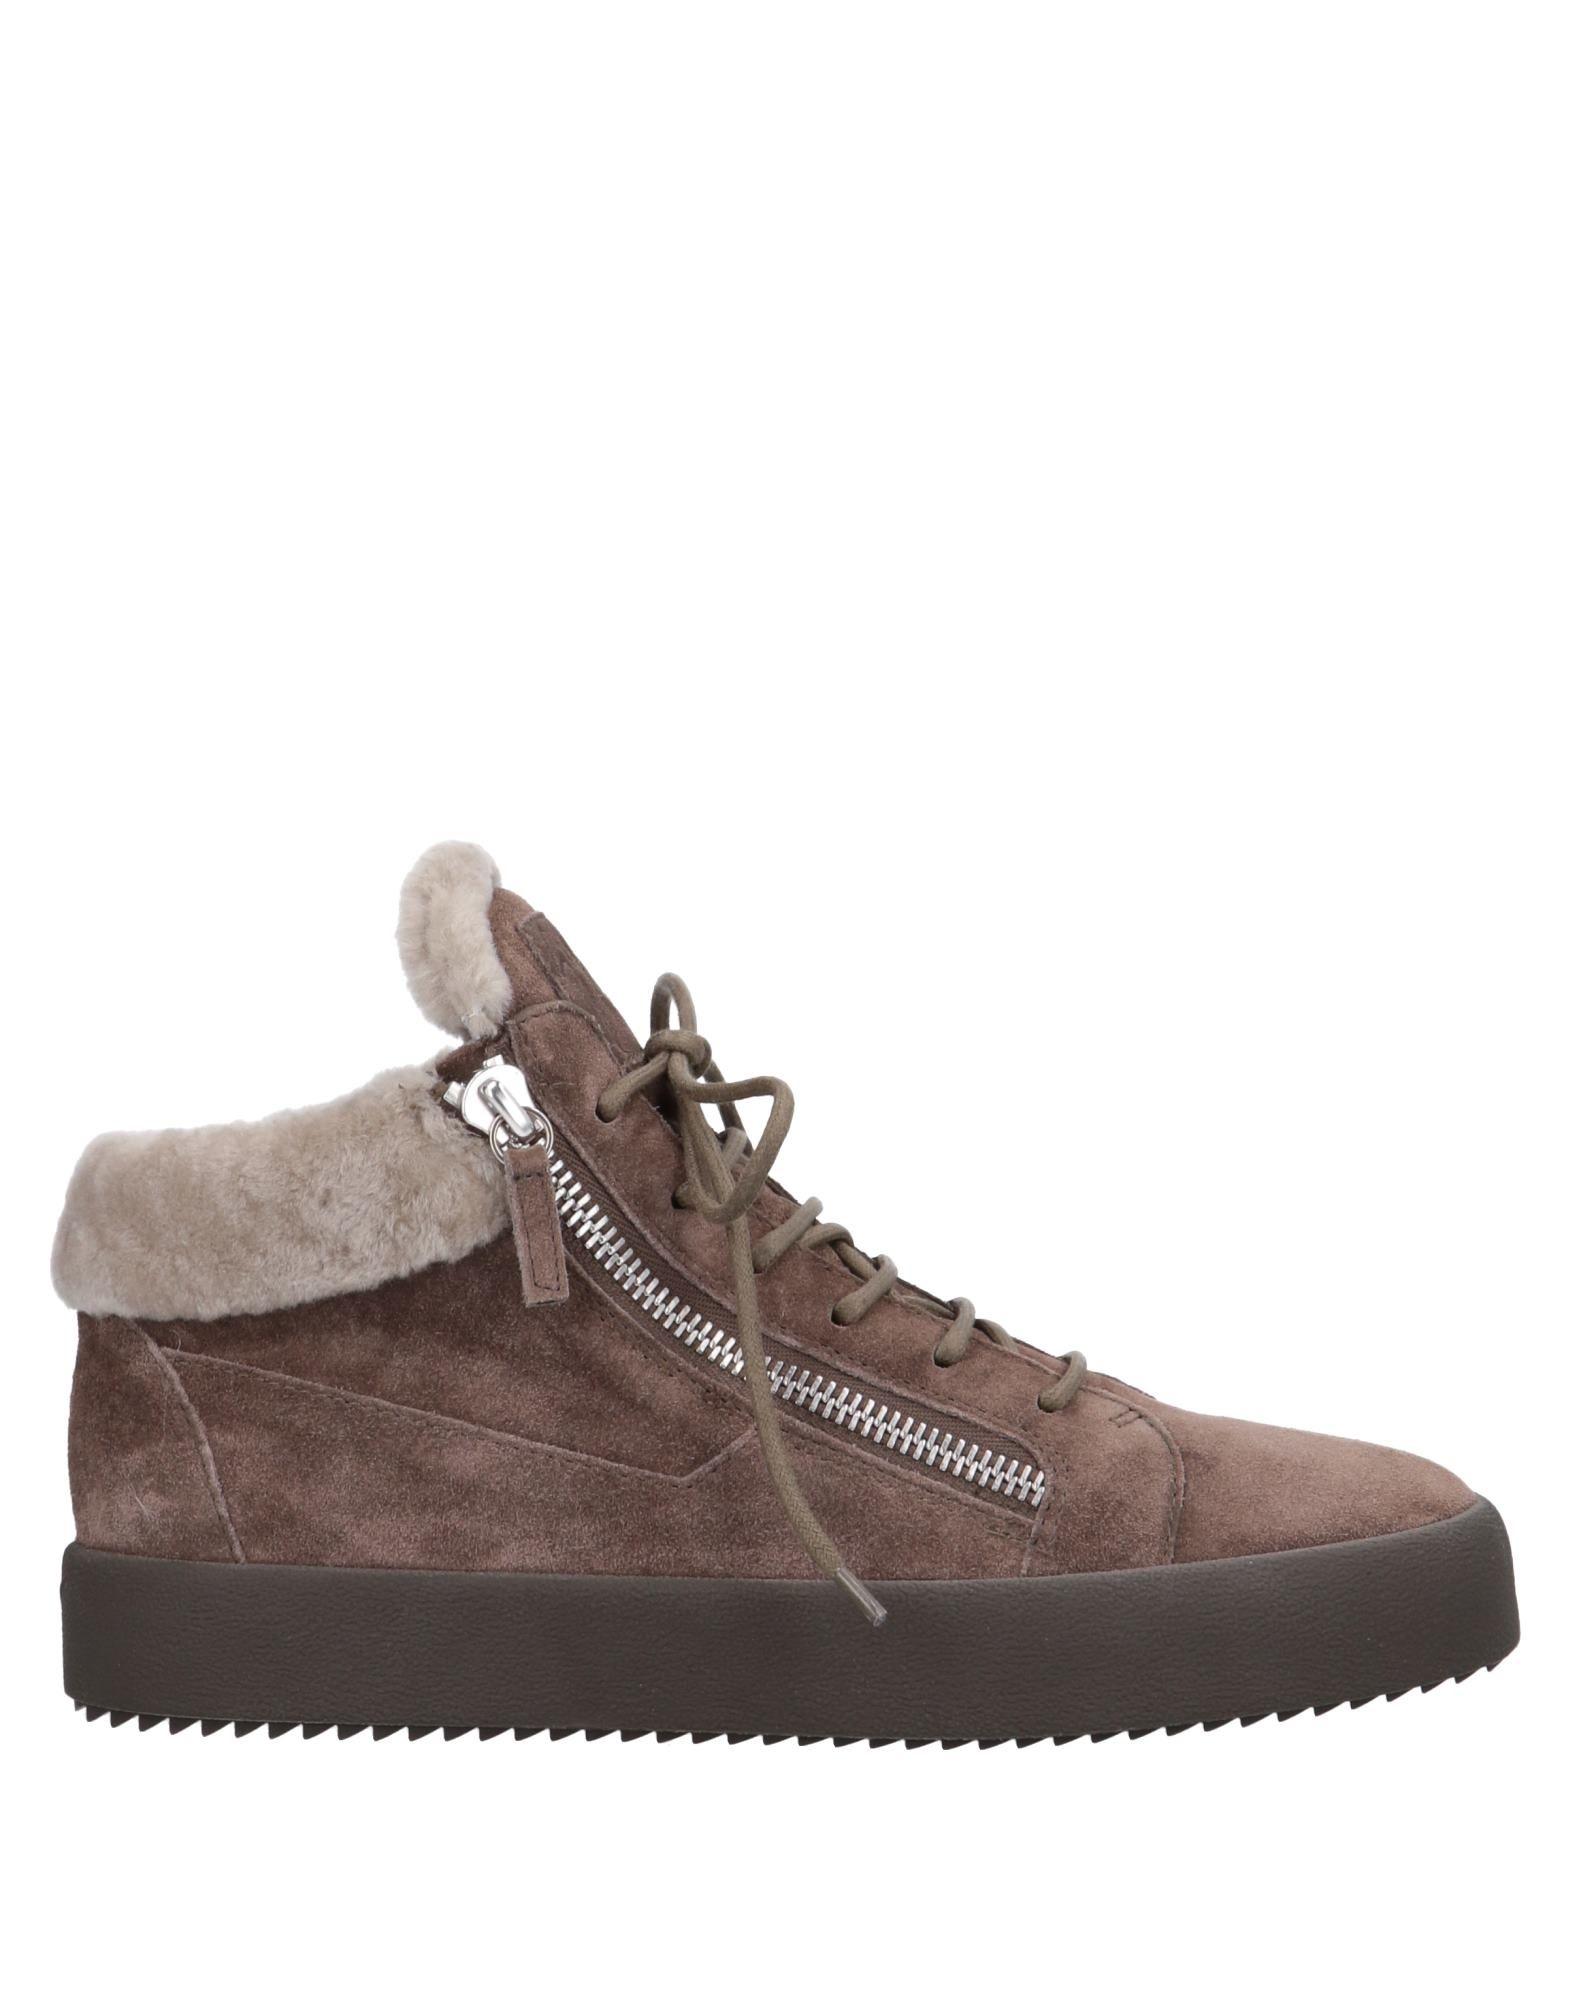 Sneakers Giuseppe Zanotti Homme - Sneakers Giuseppe Zanotti  Gris tourterelle Super rabais